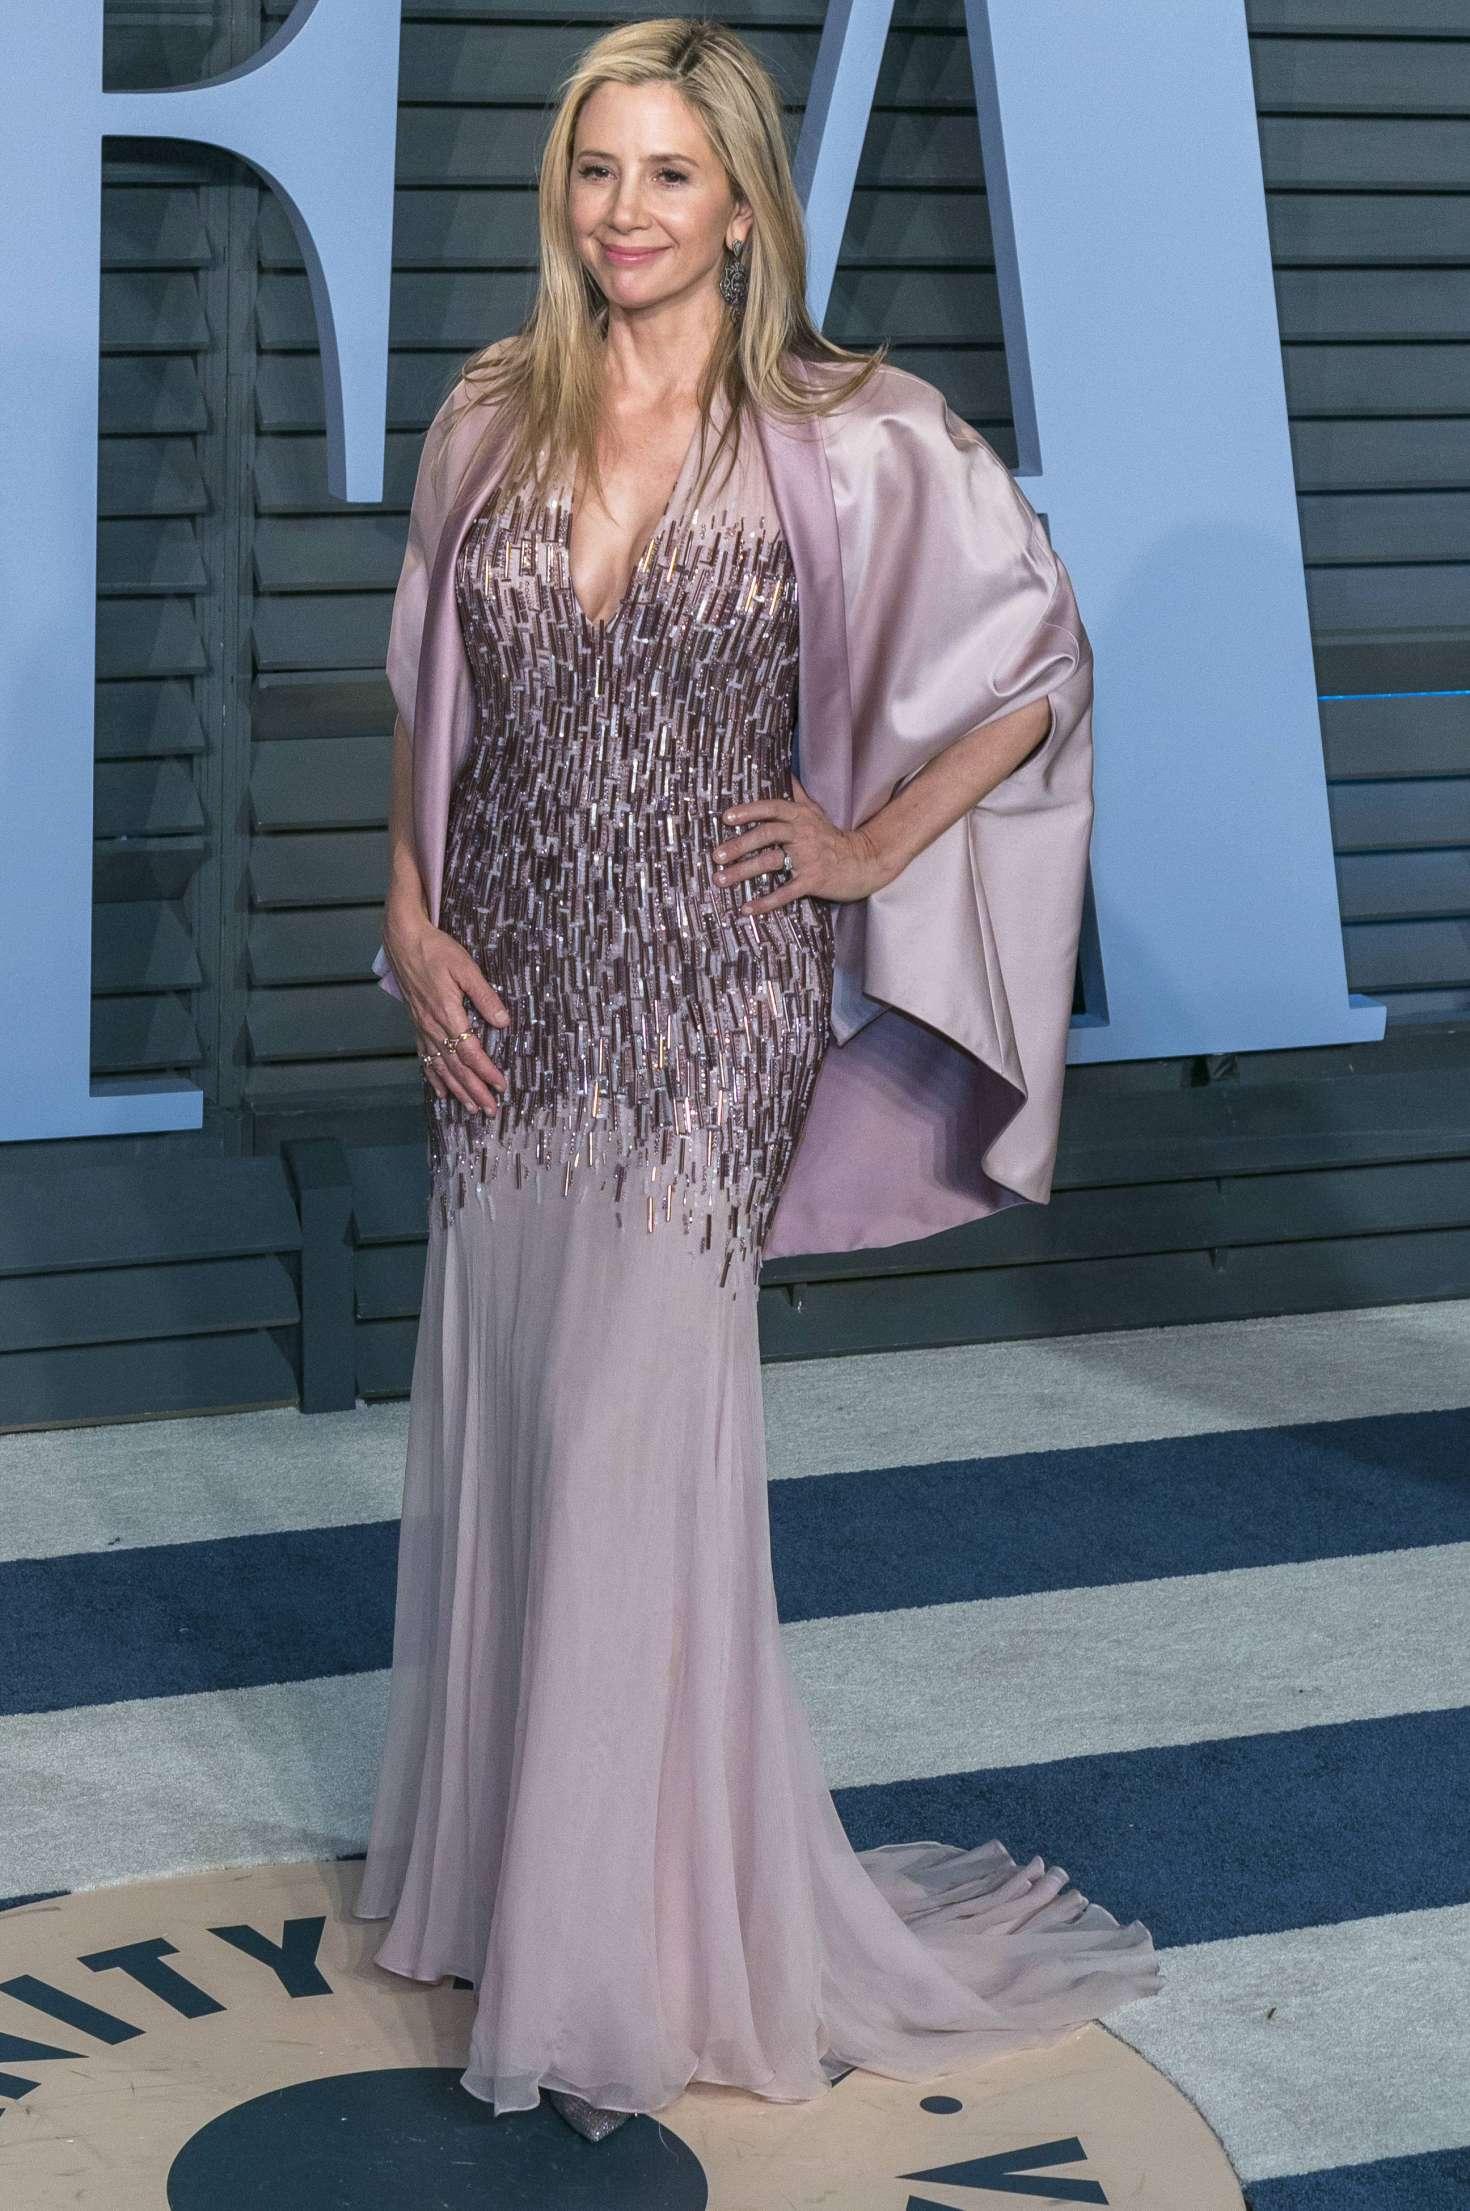 Mira Sorvino 2018 : Mira Sorvino: 2018 Vanity Fair Oscar Party -02